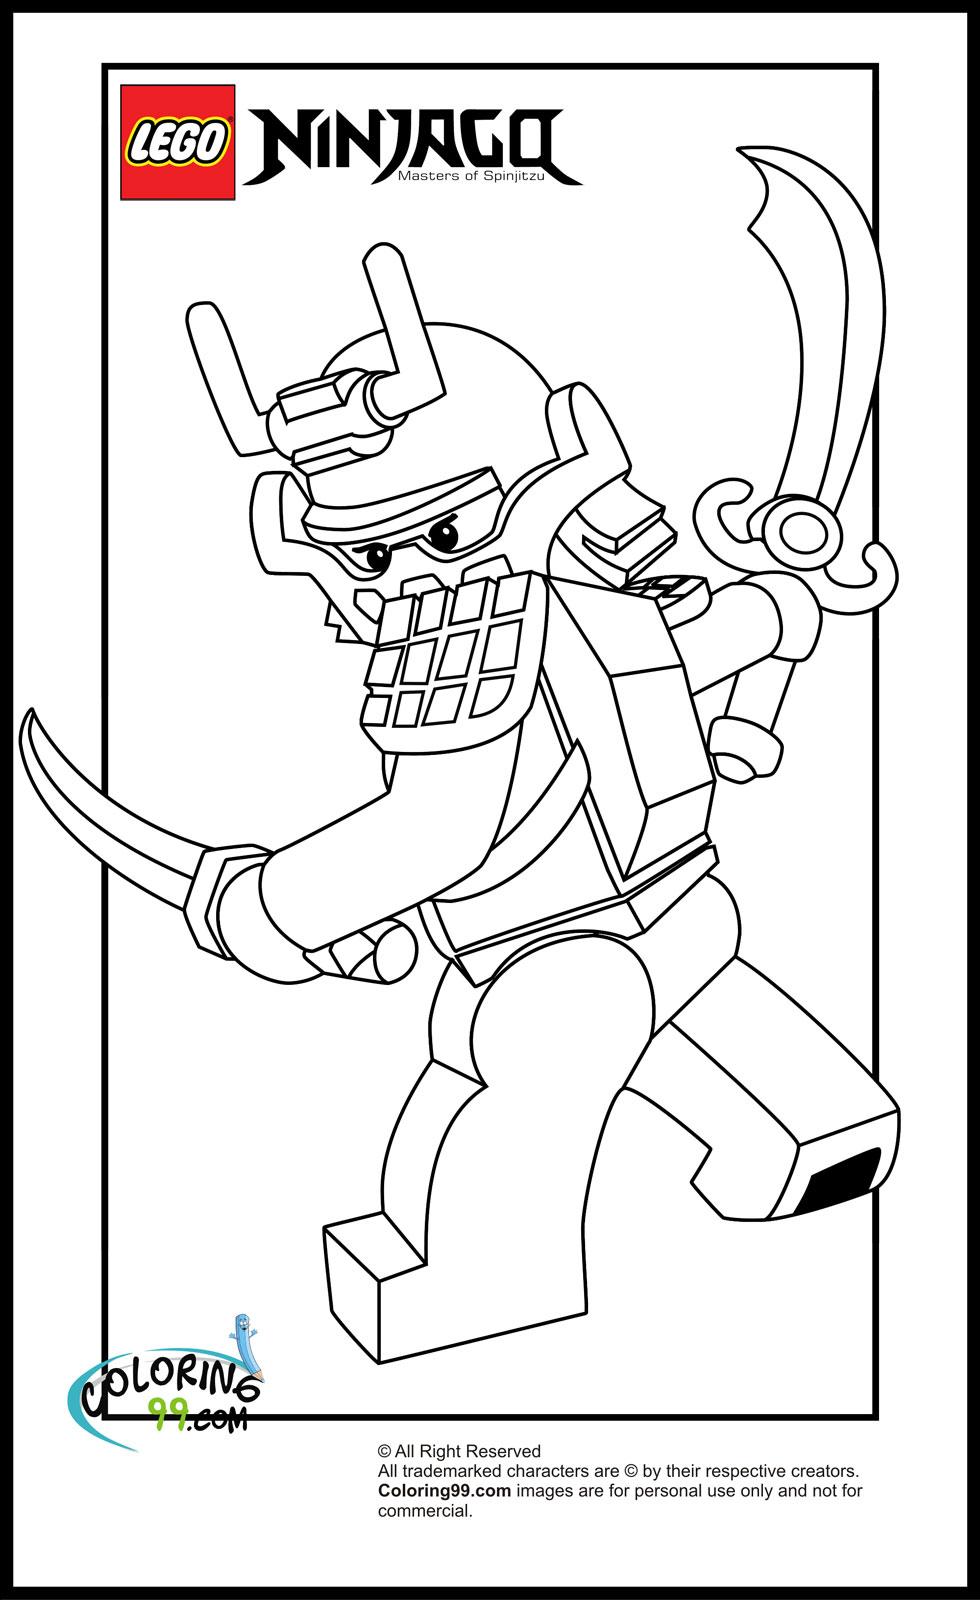 Coloriage Ninjago #34 (Dessins Animés) - Coloriages à imprimer